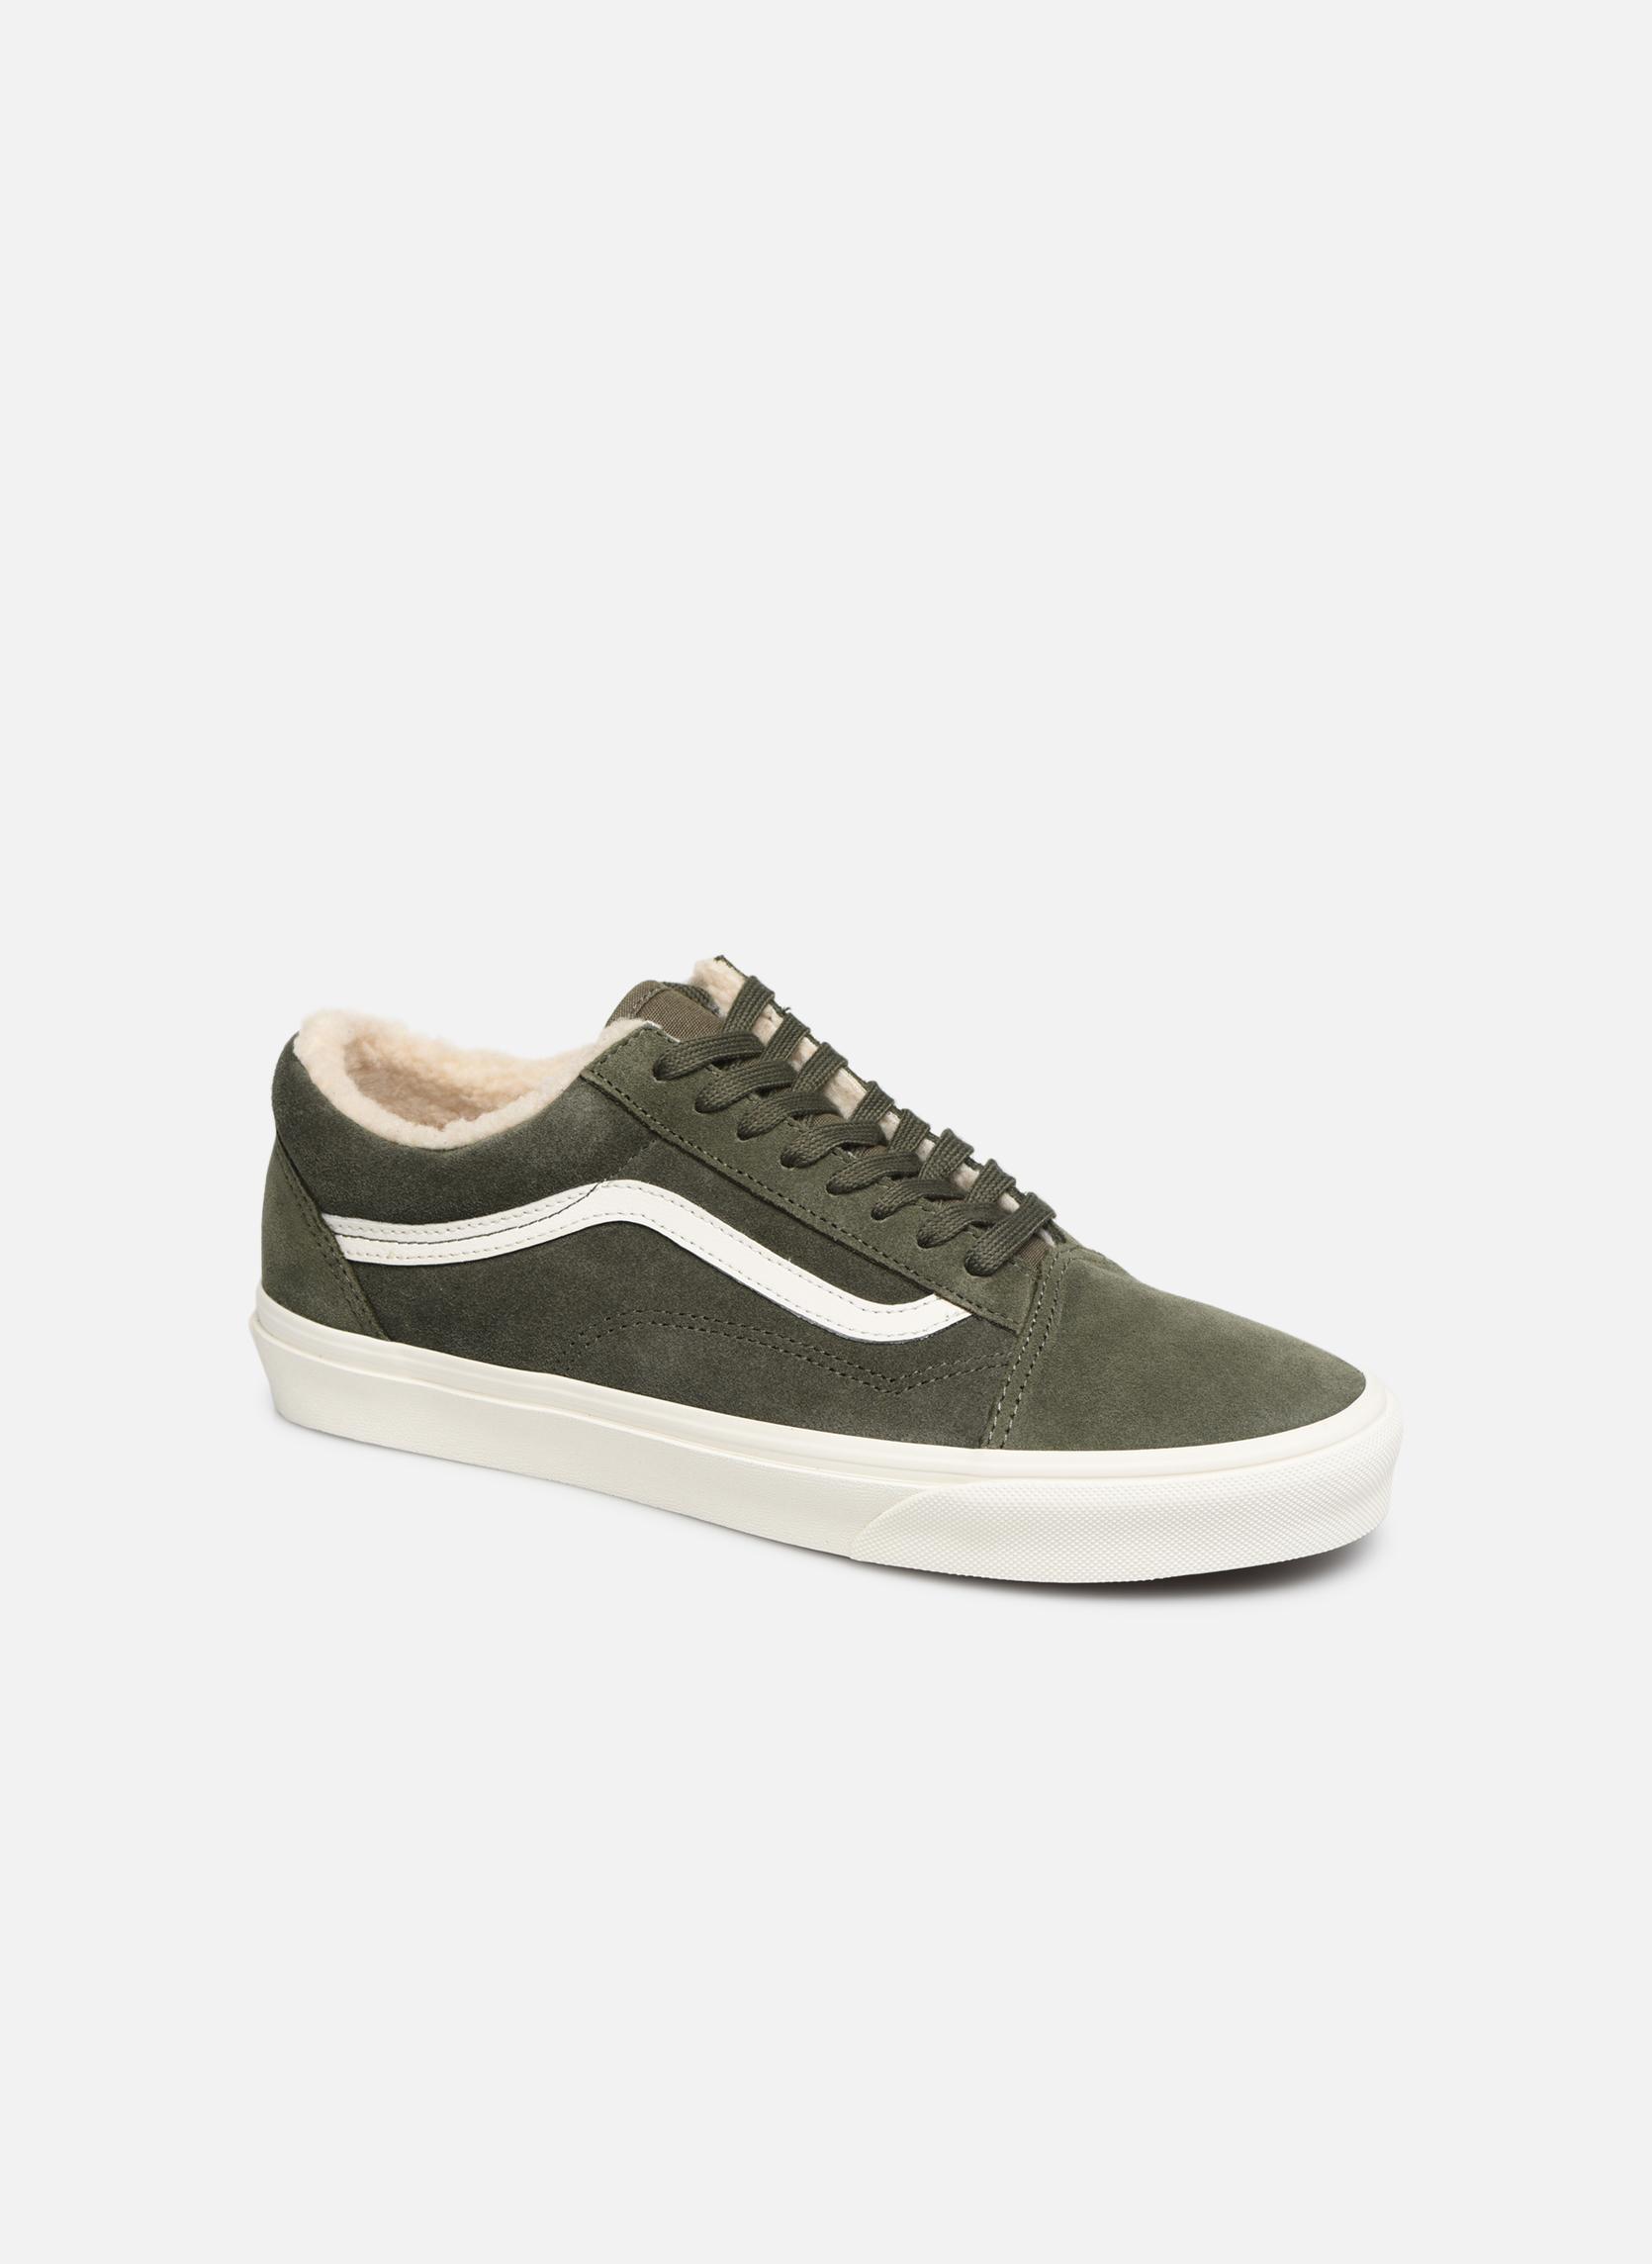 Sneakers Vans Groen